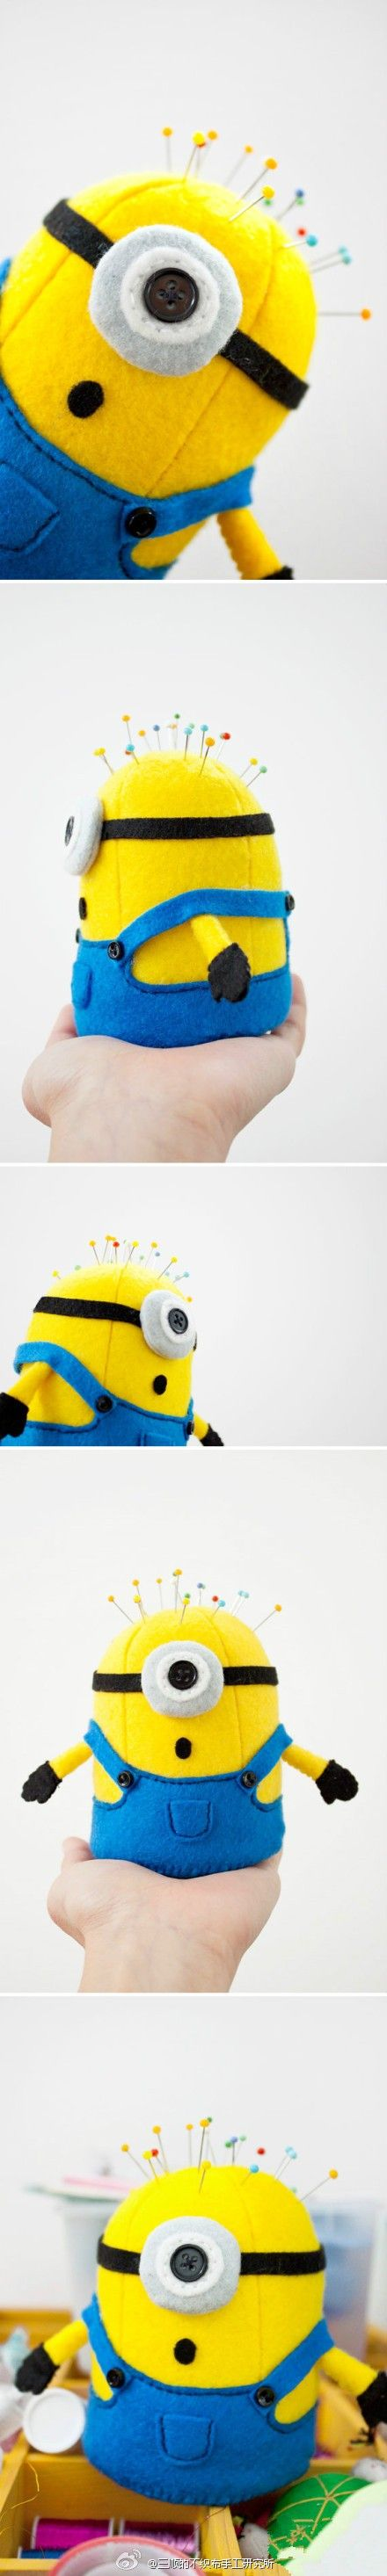 Minion pincushion! @Katie Hrubec Hrubec Hrubec Lee